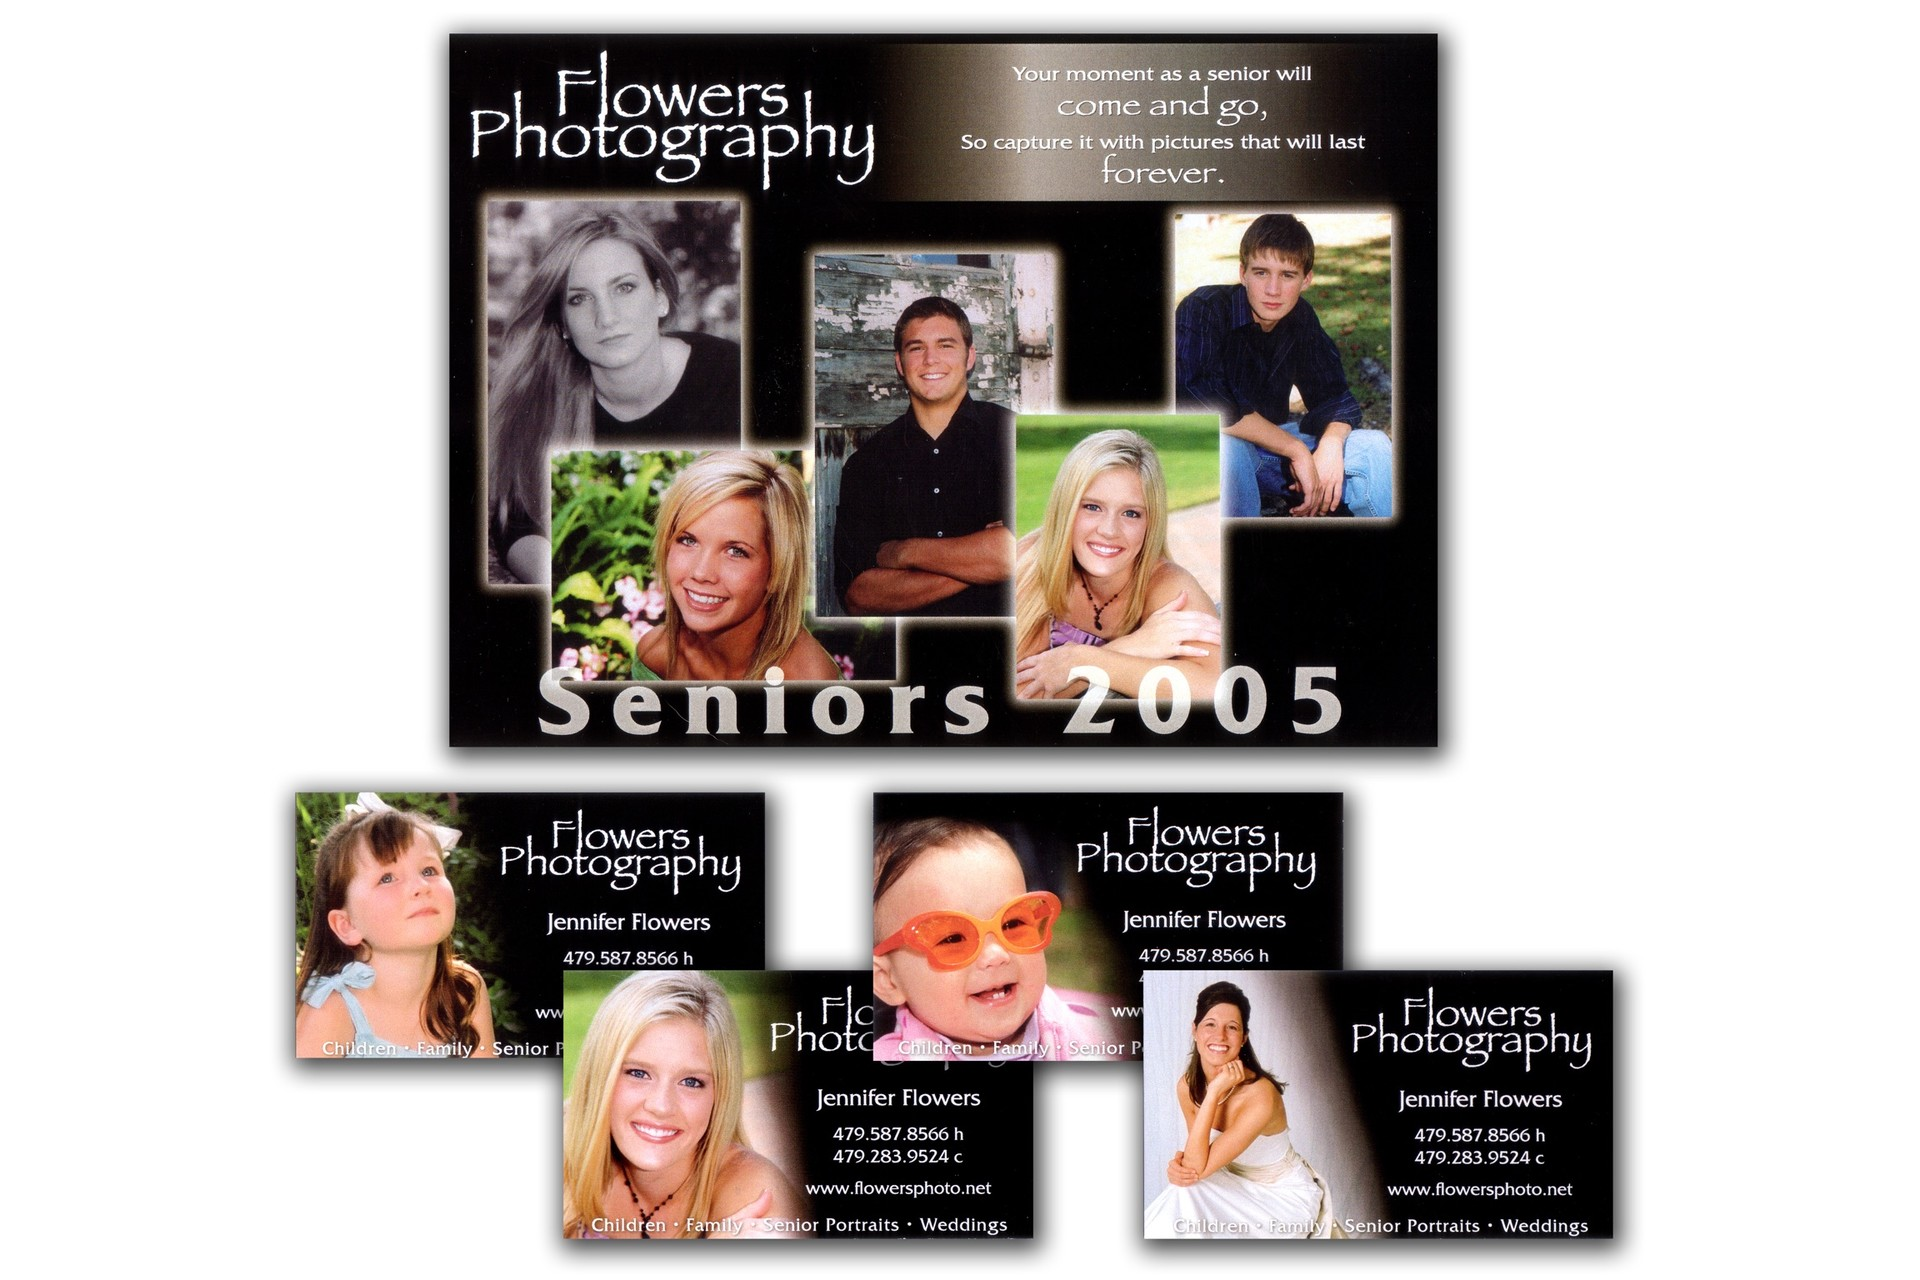 Artstation postcard business cards karla winters postcard business cards reheart Image collections